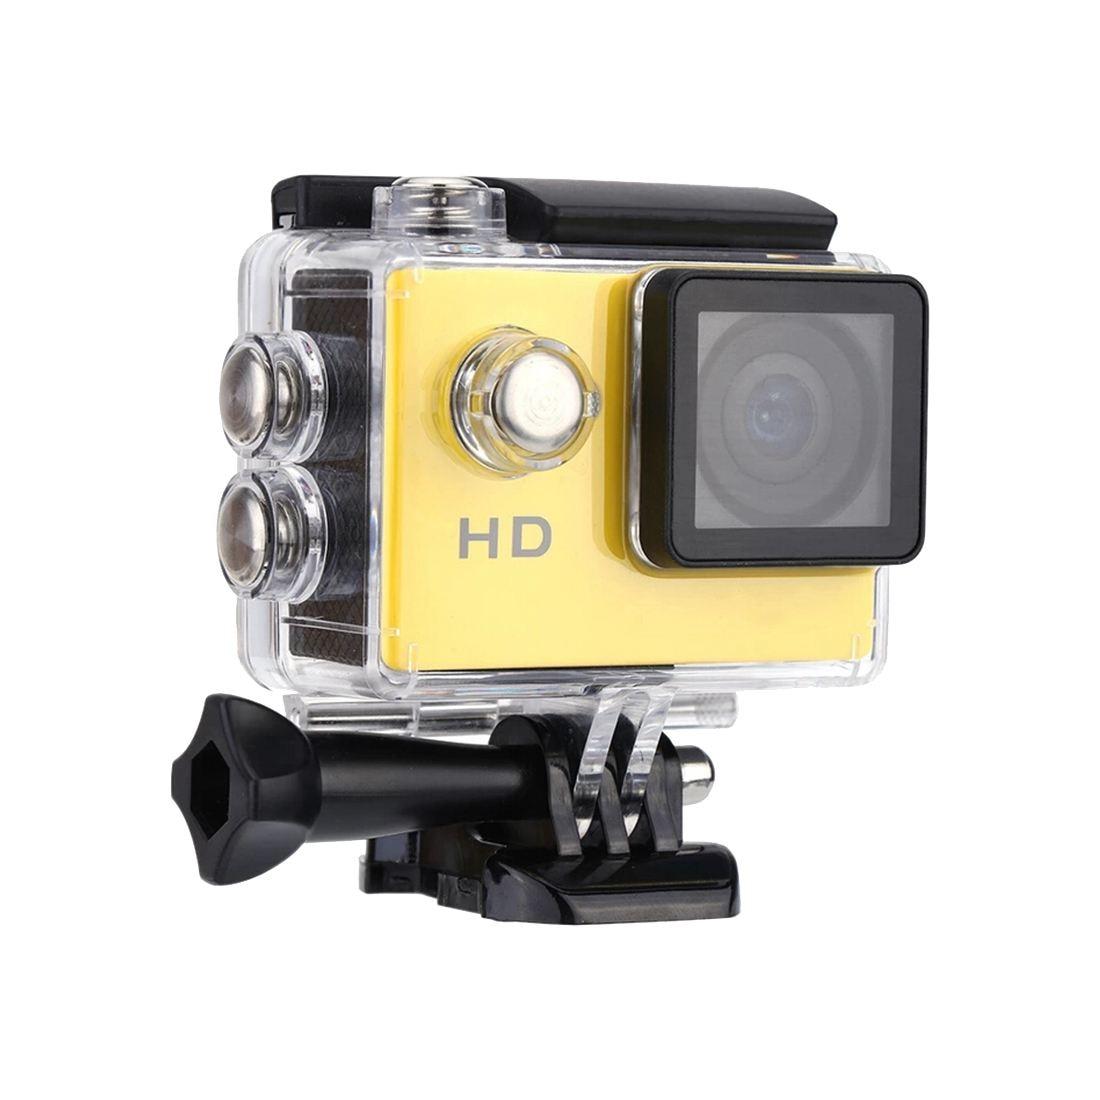 Promotion! Waterproof Sports DV 720P HD Video Action Camera Video Camcorder Car DVR SJ4000